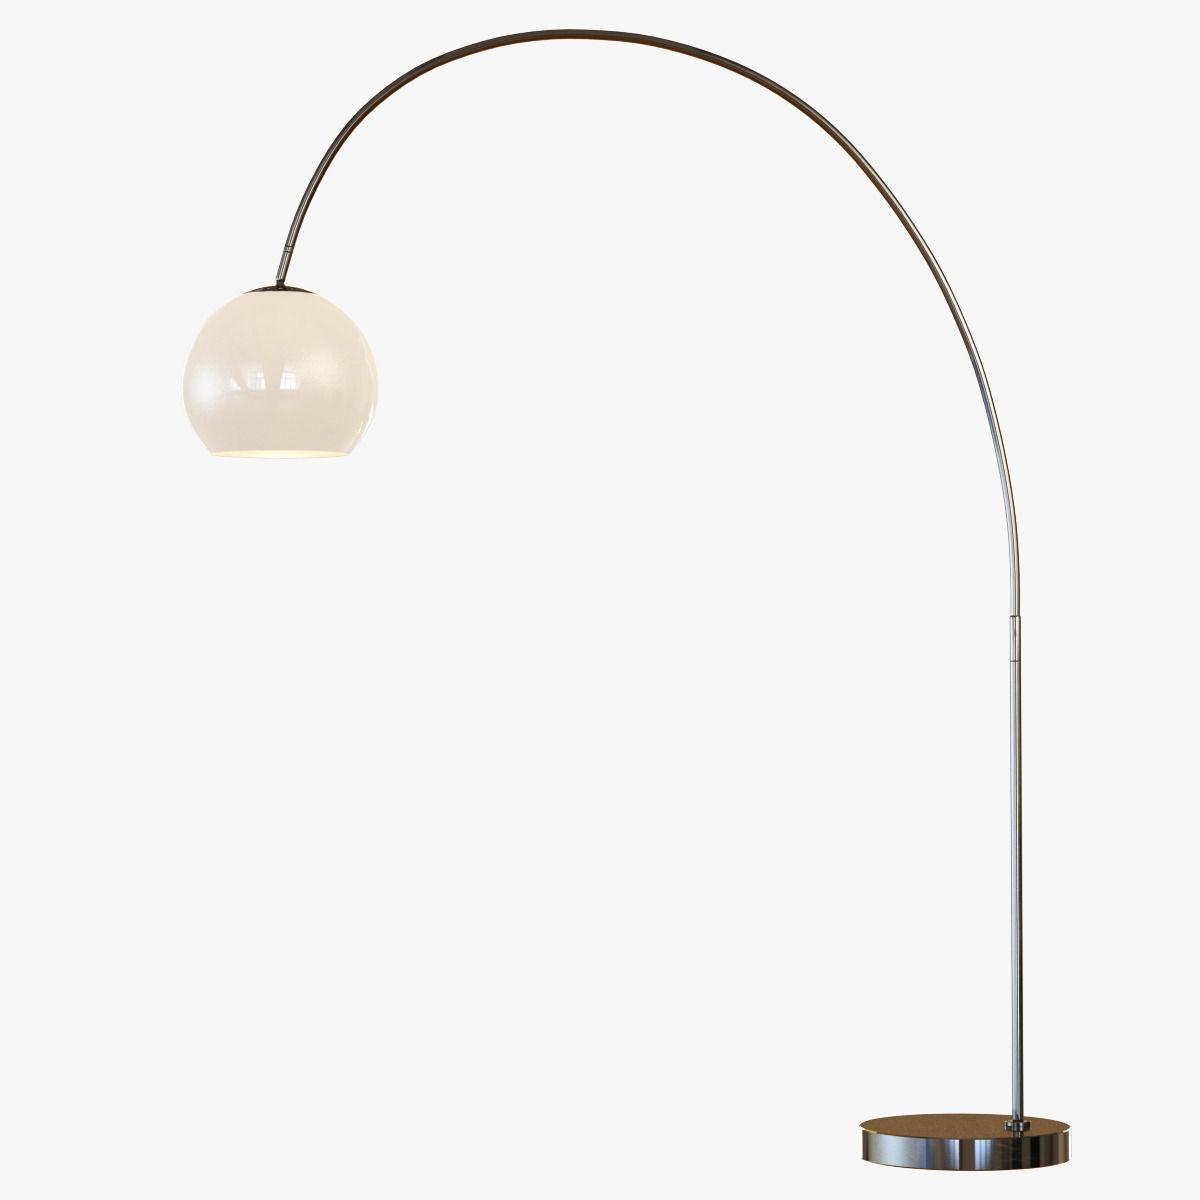 Overarching Acrylic Shade Floor Lamp 3d Model Max Obj 3ds